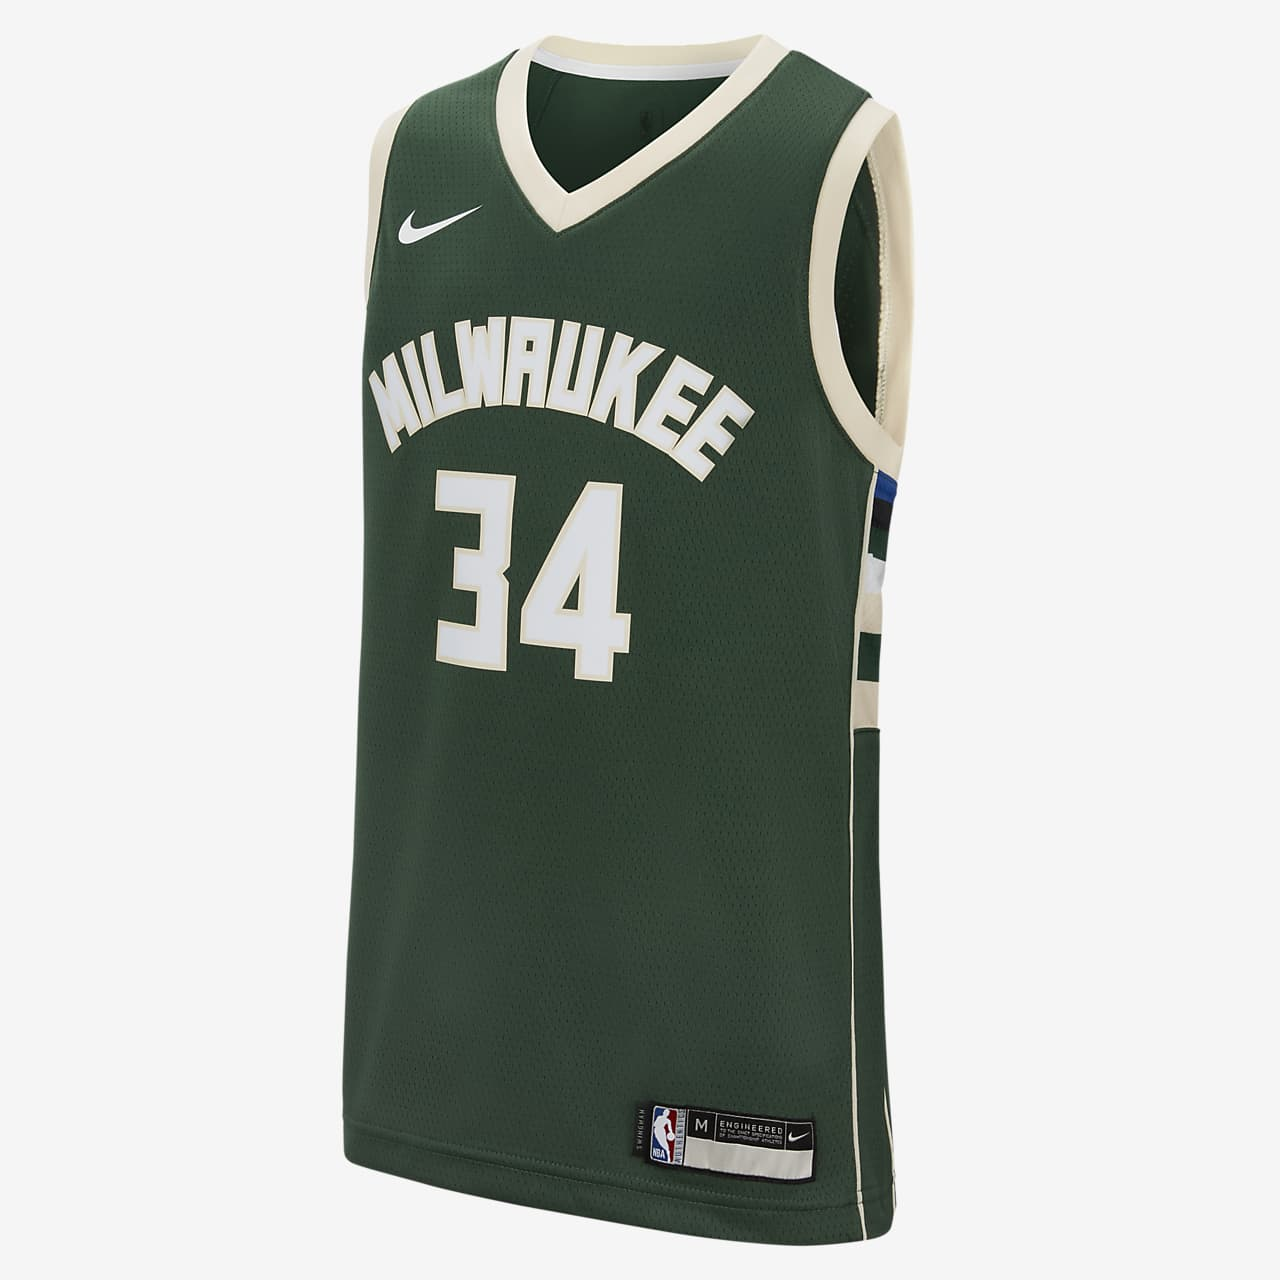 密尔沃基雄鹿队 Icon Edition Swingman Jersey Nike NBA Jersey大童(男孩)球衣